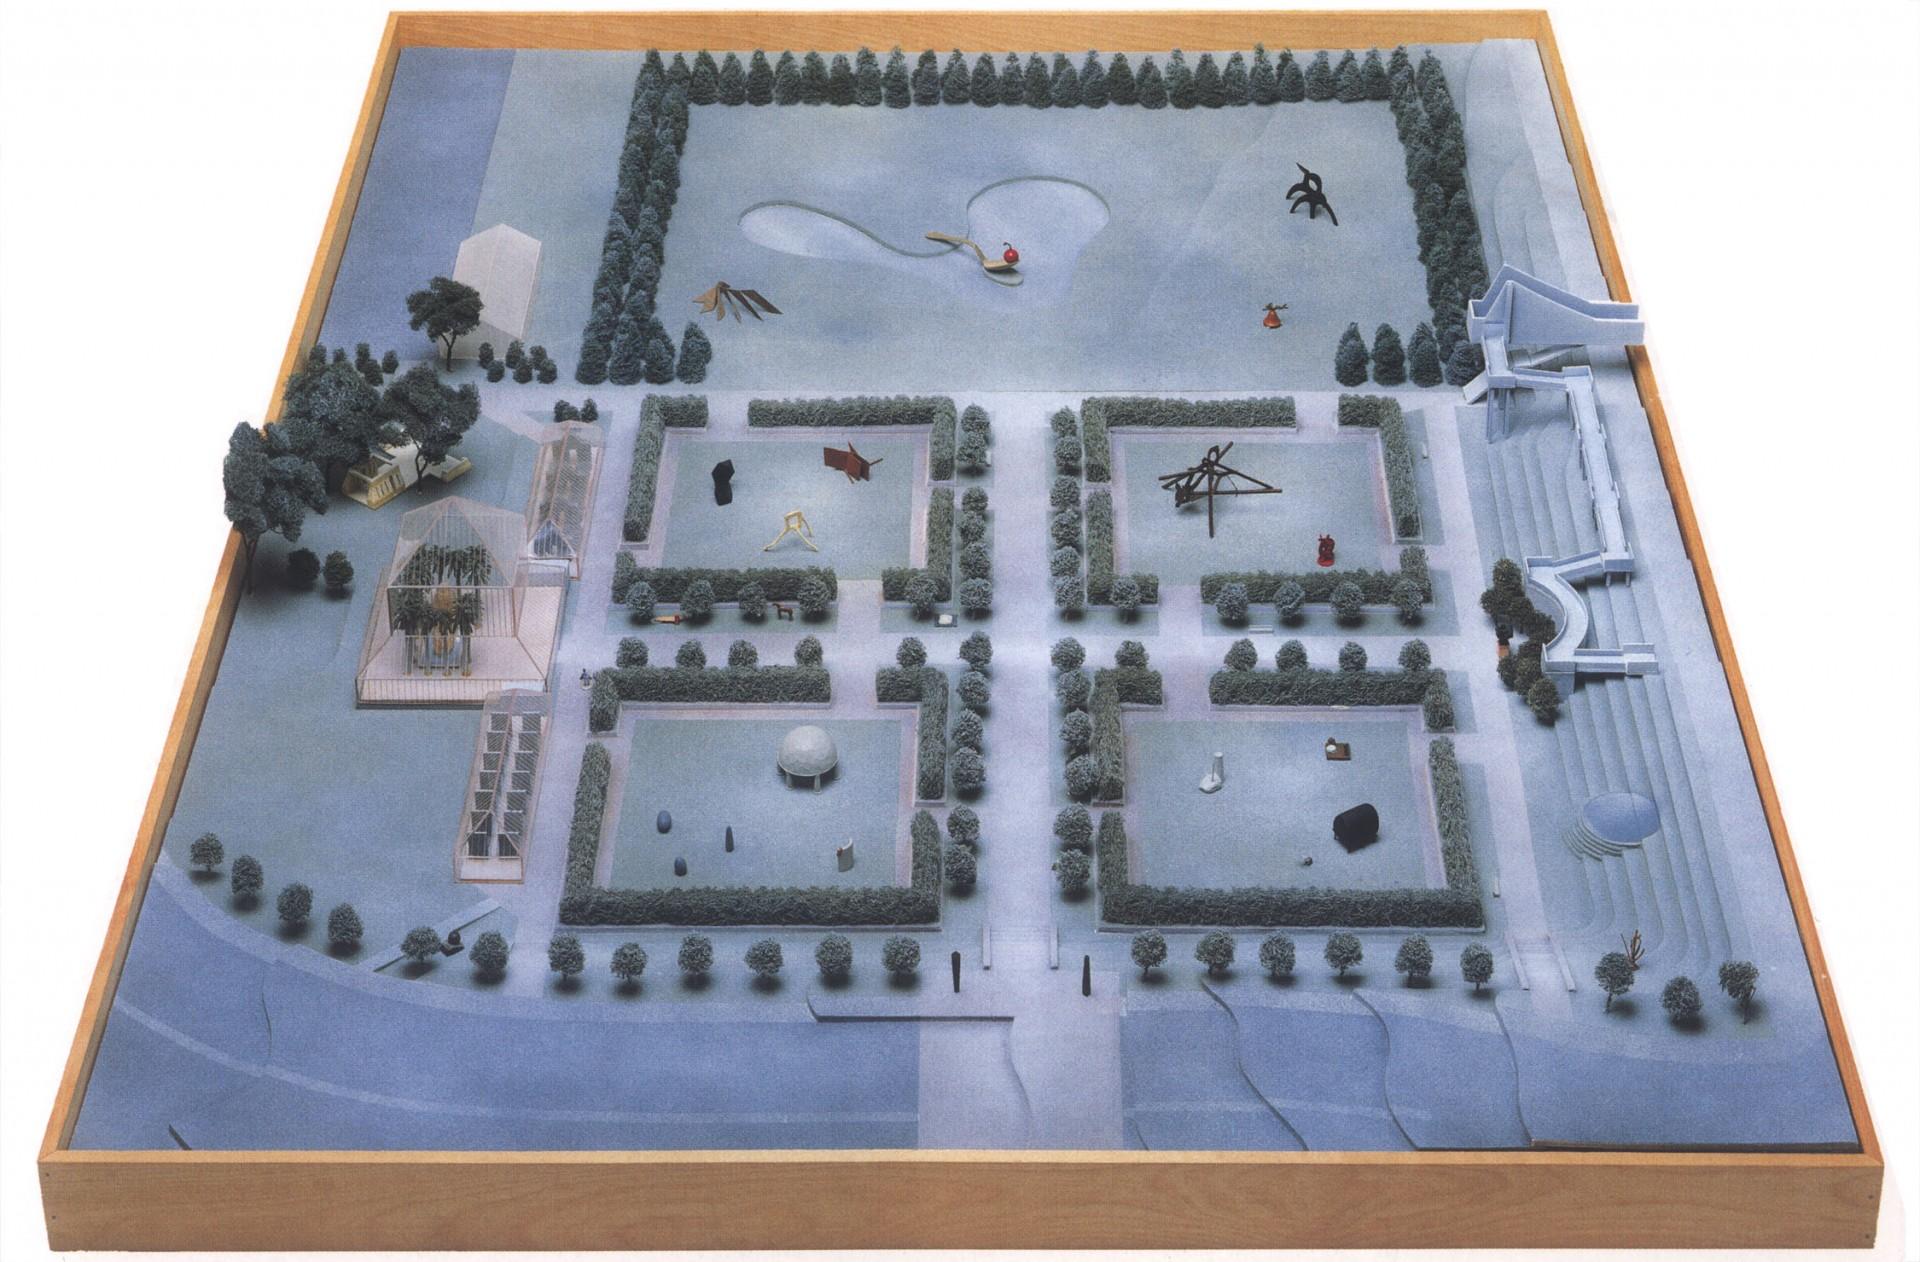 Minneapolis Sculpture Garden landscape architecture